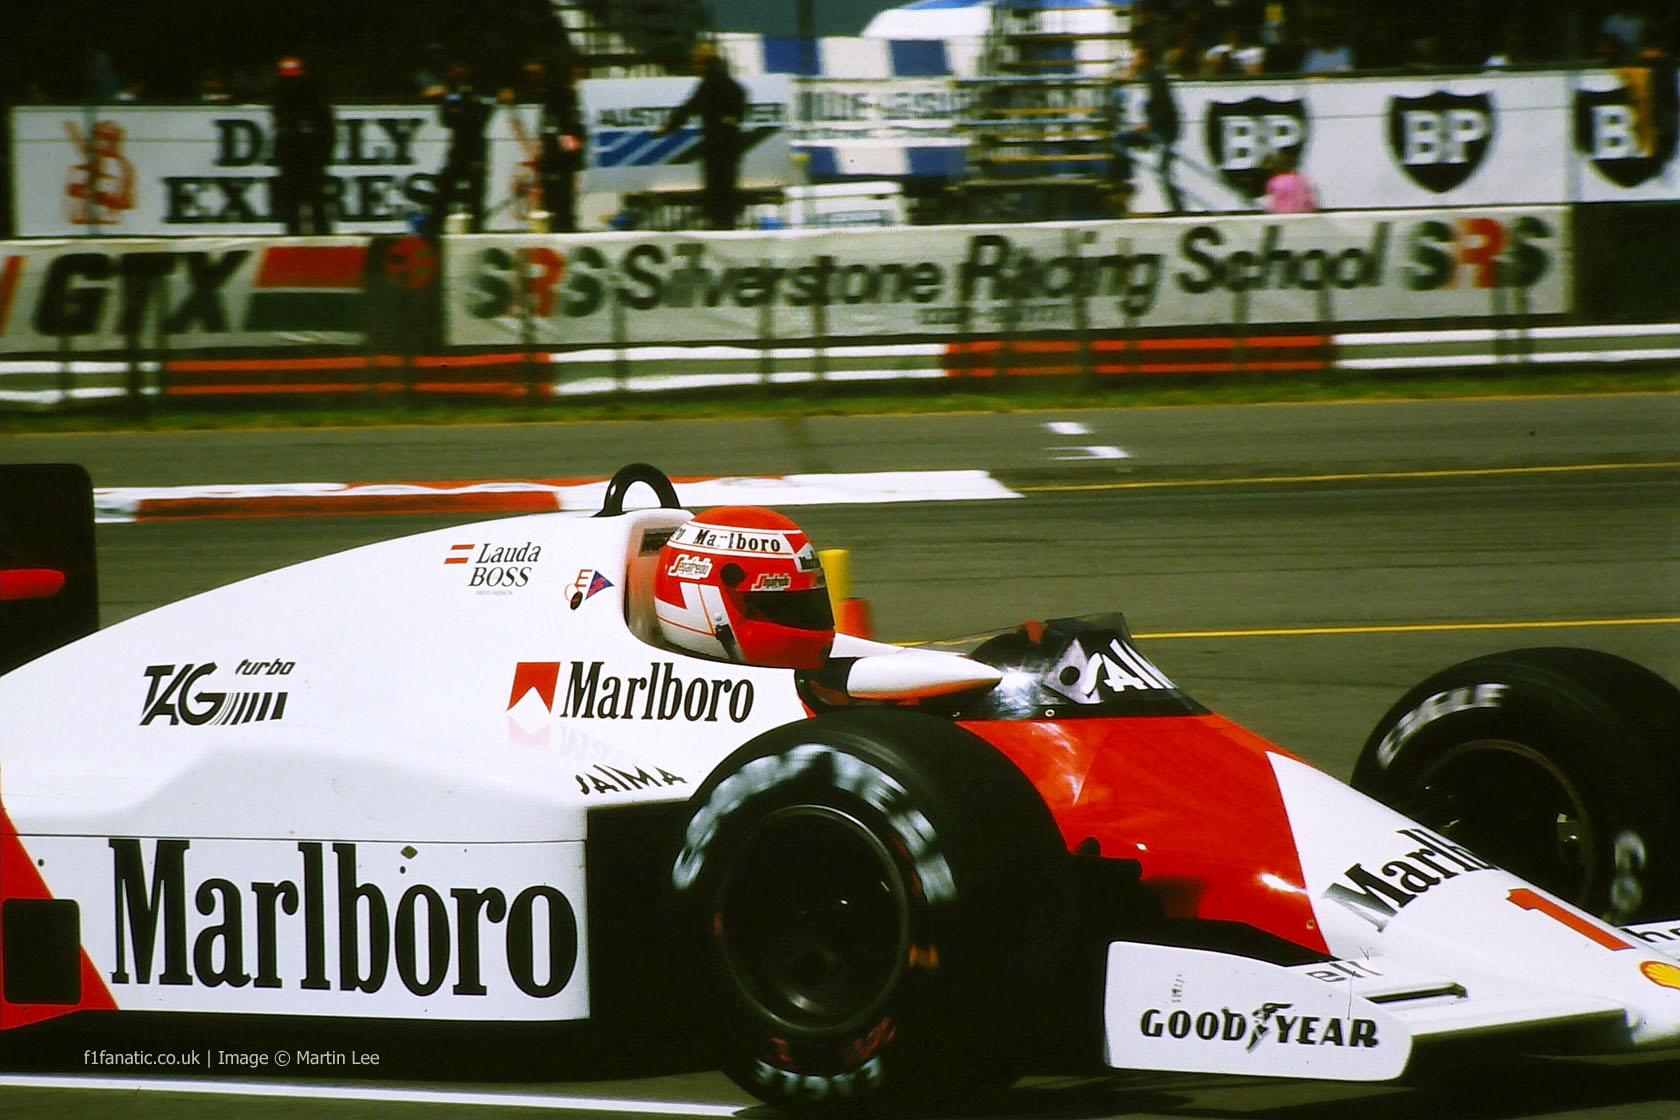 Niki Lauda, McLaren, Silverstone, 1985